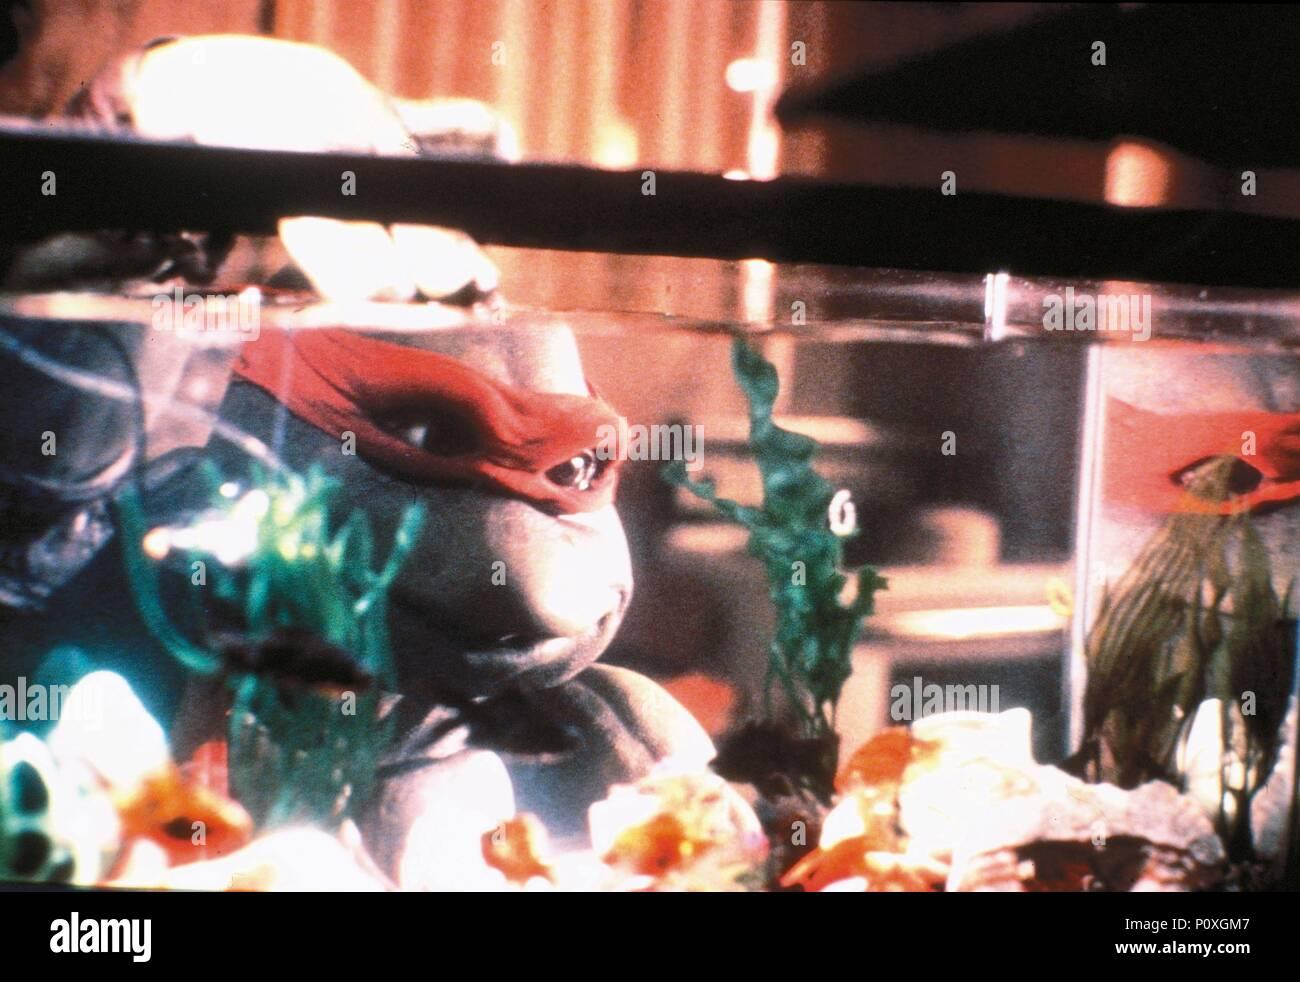 Original Film Title: TEENAGE MUTANT NINJA TURTLES.  English Title: TEENAGE MUTANT NINJA TURTLES.  Film Director: STEVE BARRON.  Year: 1990. Credit: NEW LINE CINEMA / Album - Stock Image